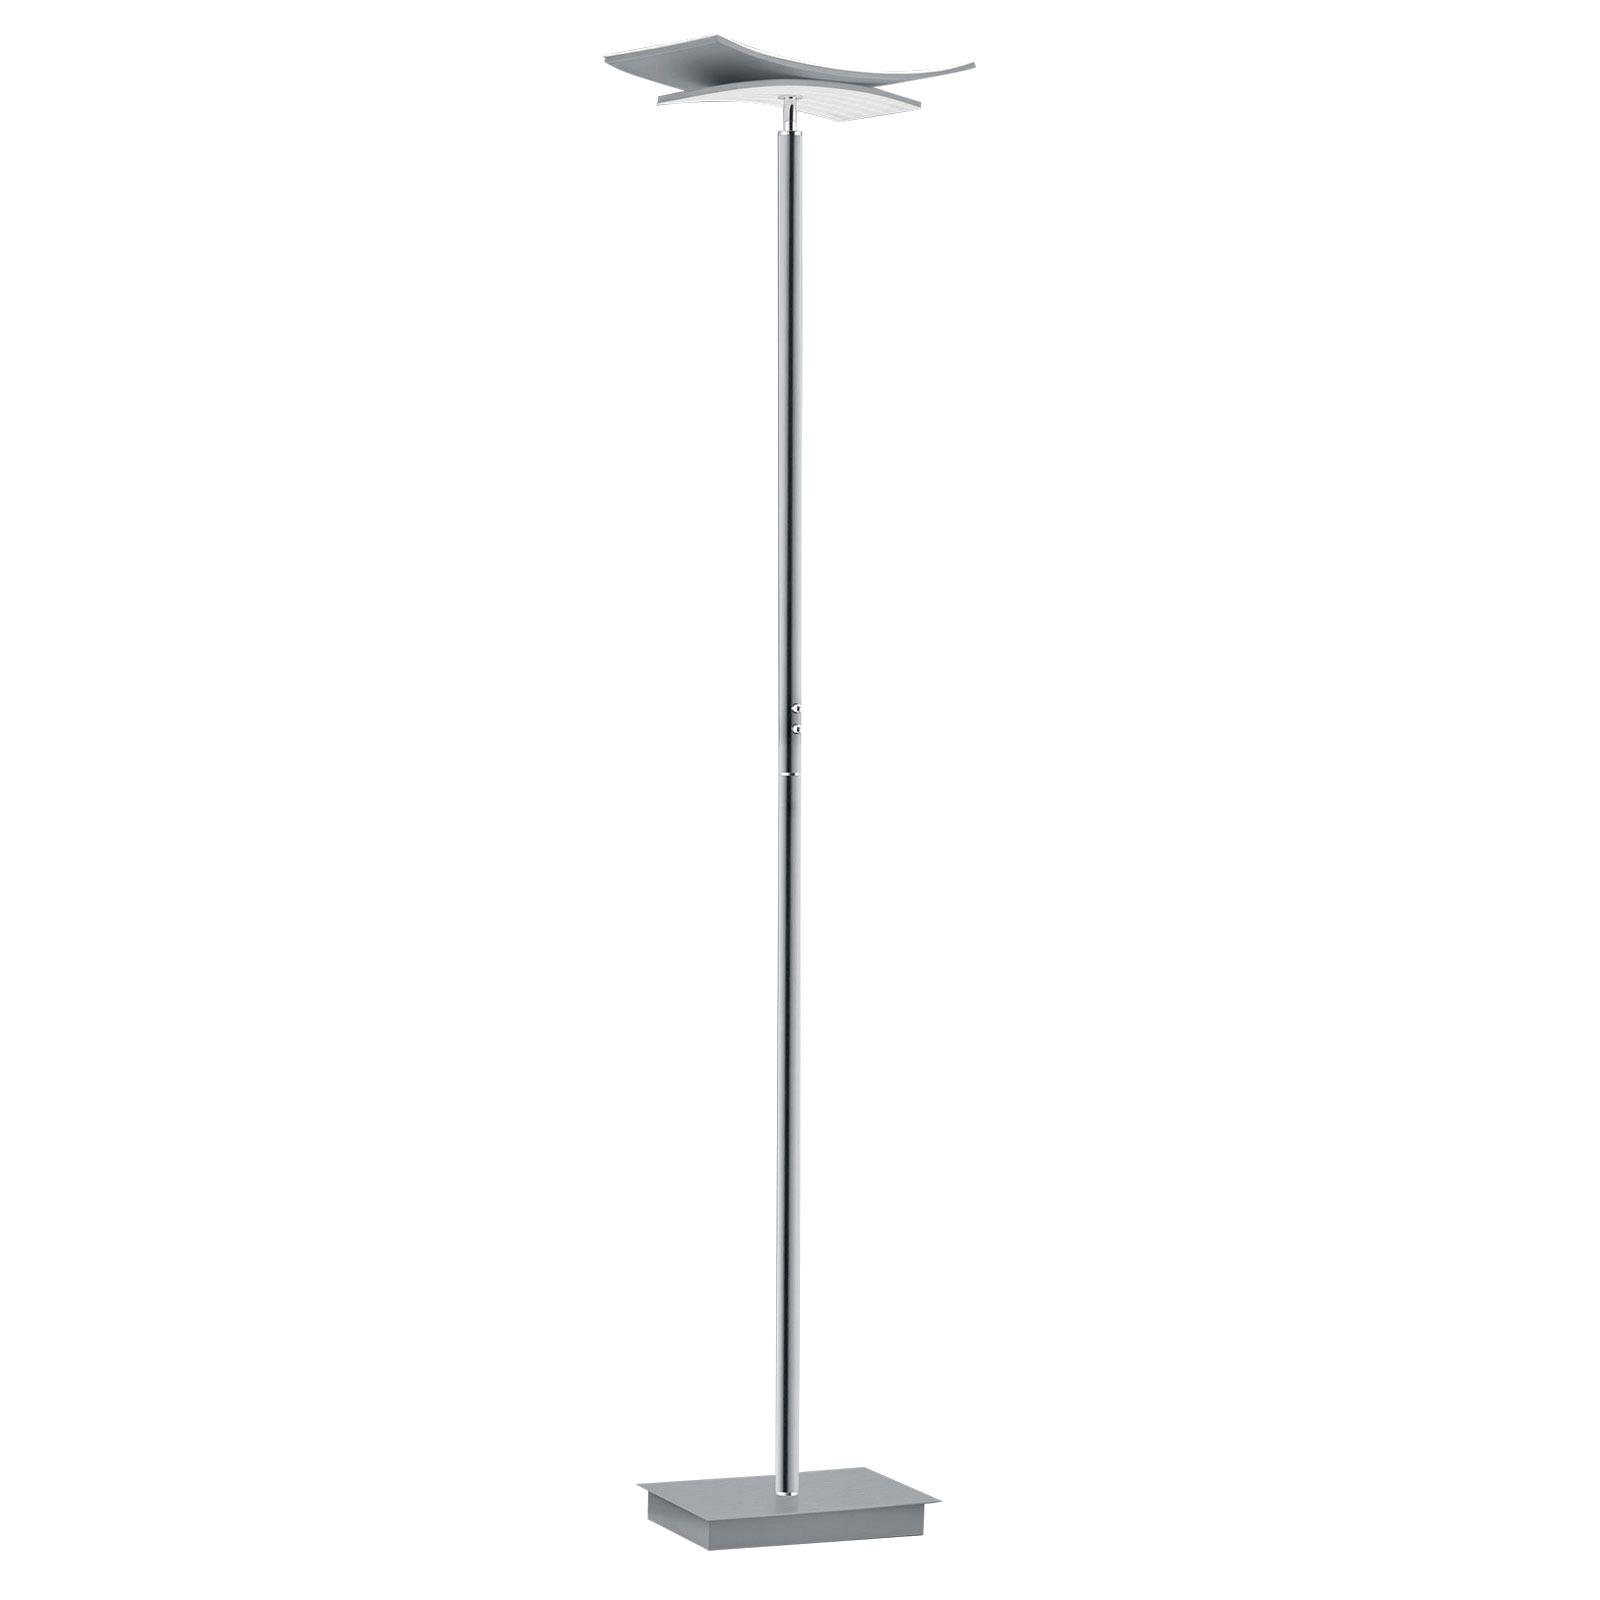 B-Leuchten Liberty lampa stojąca LED nikiel matowy